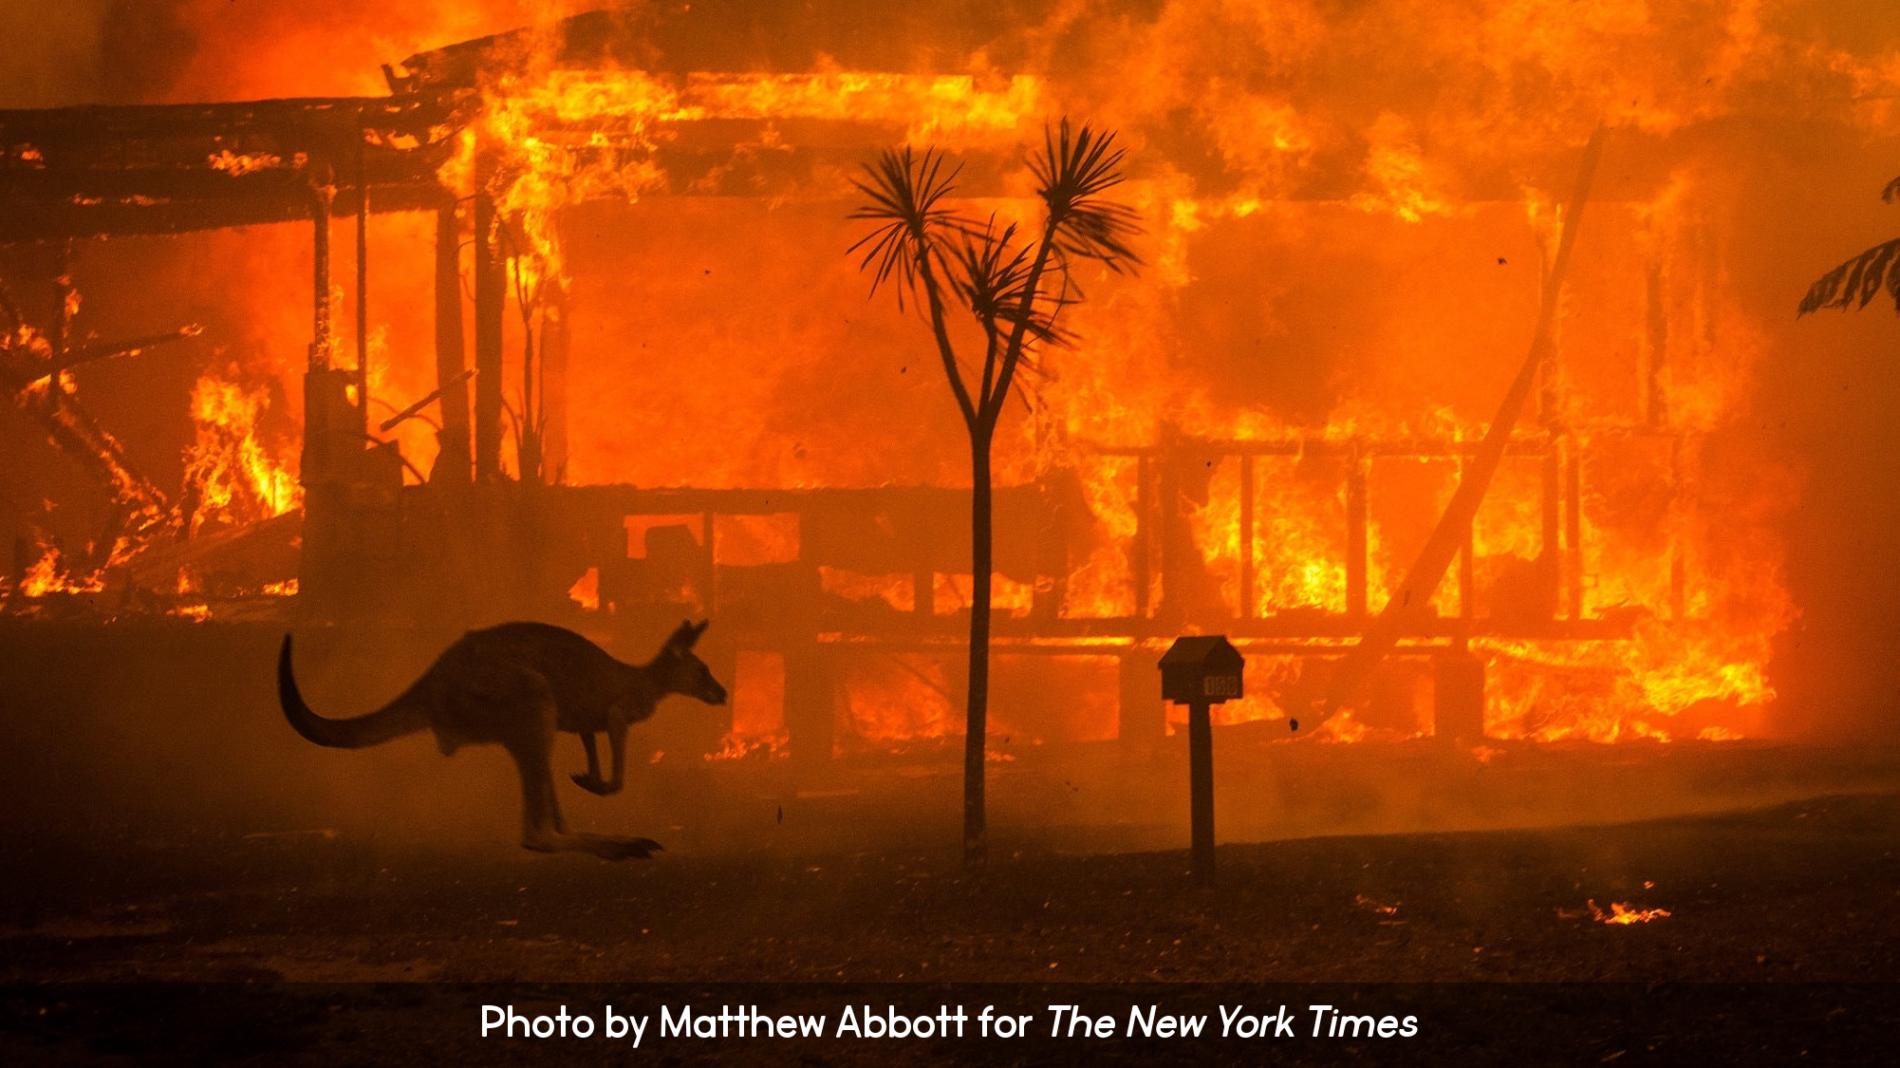 Australia Wildfire December 2019